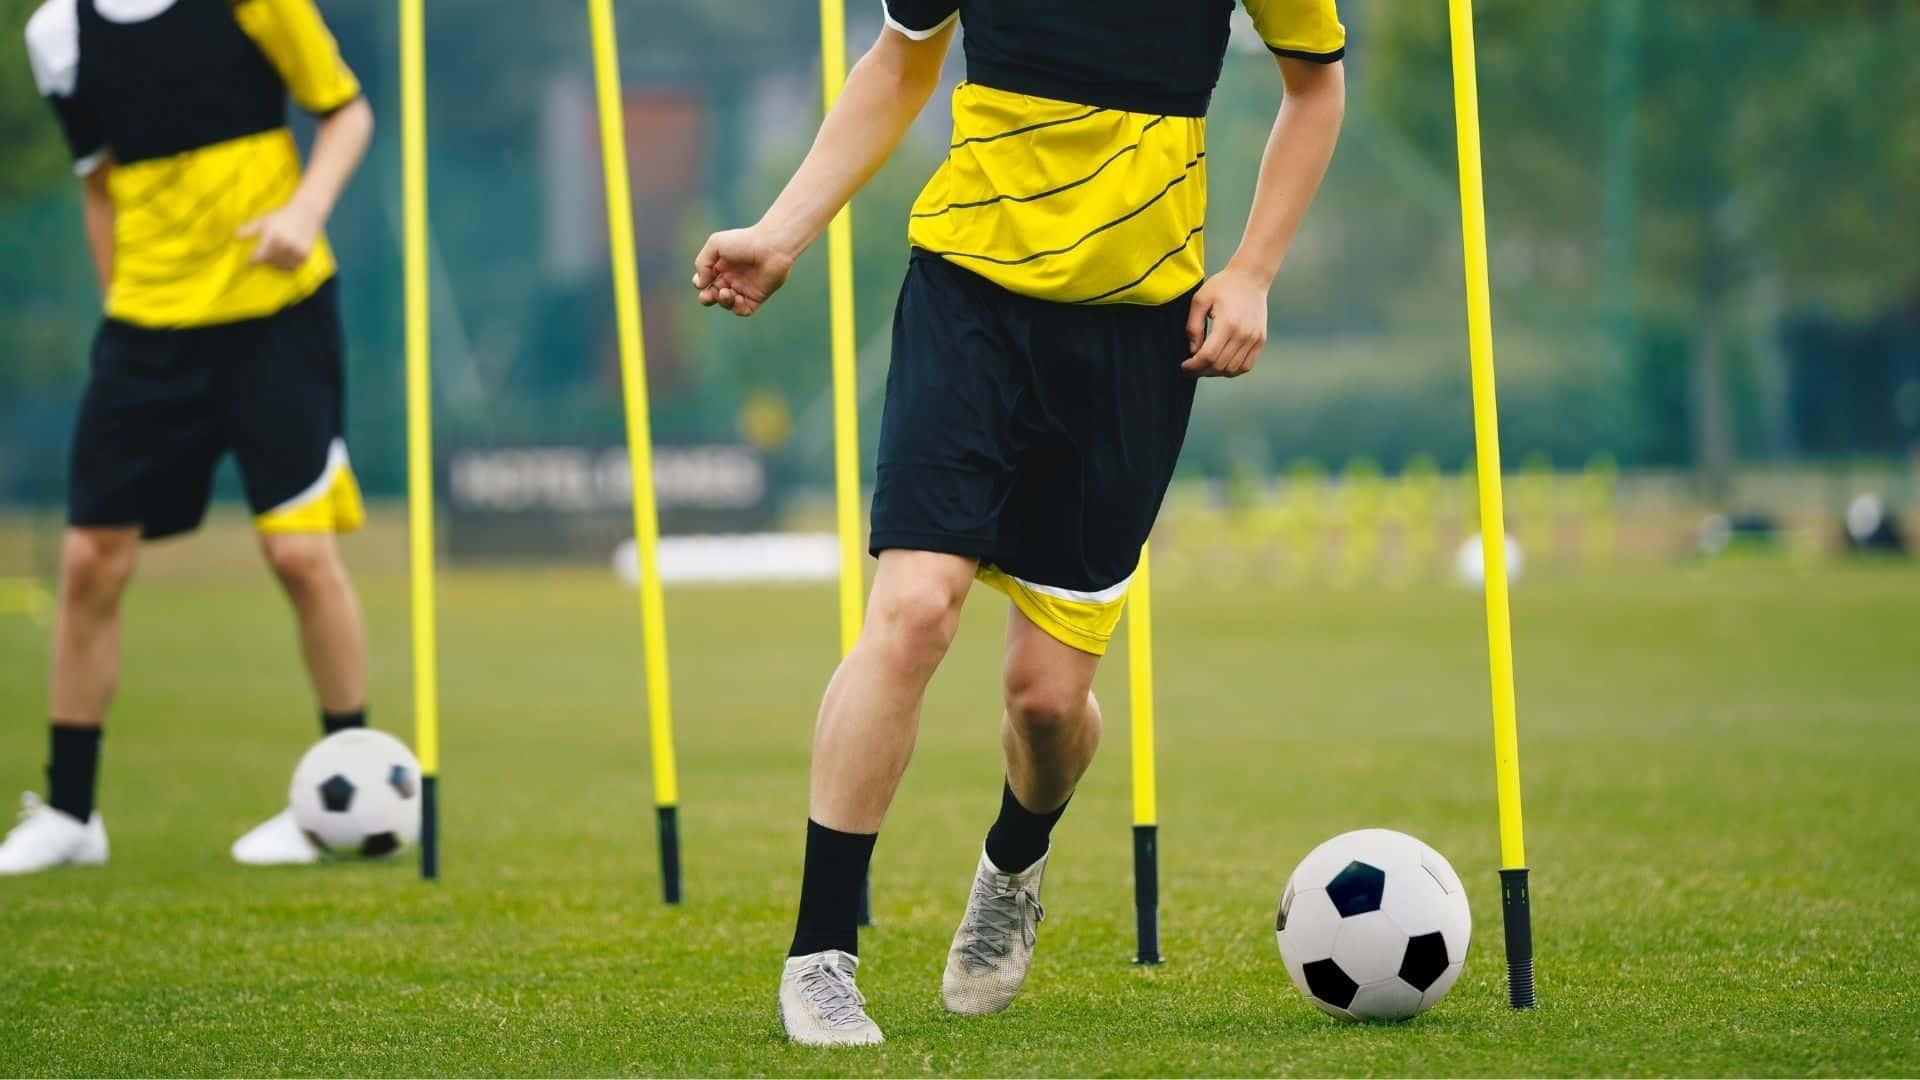 hip bursitis causes, symptoms, and treatments